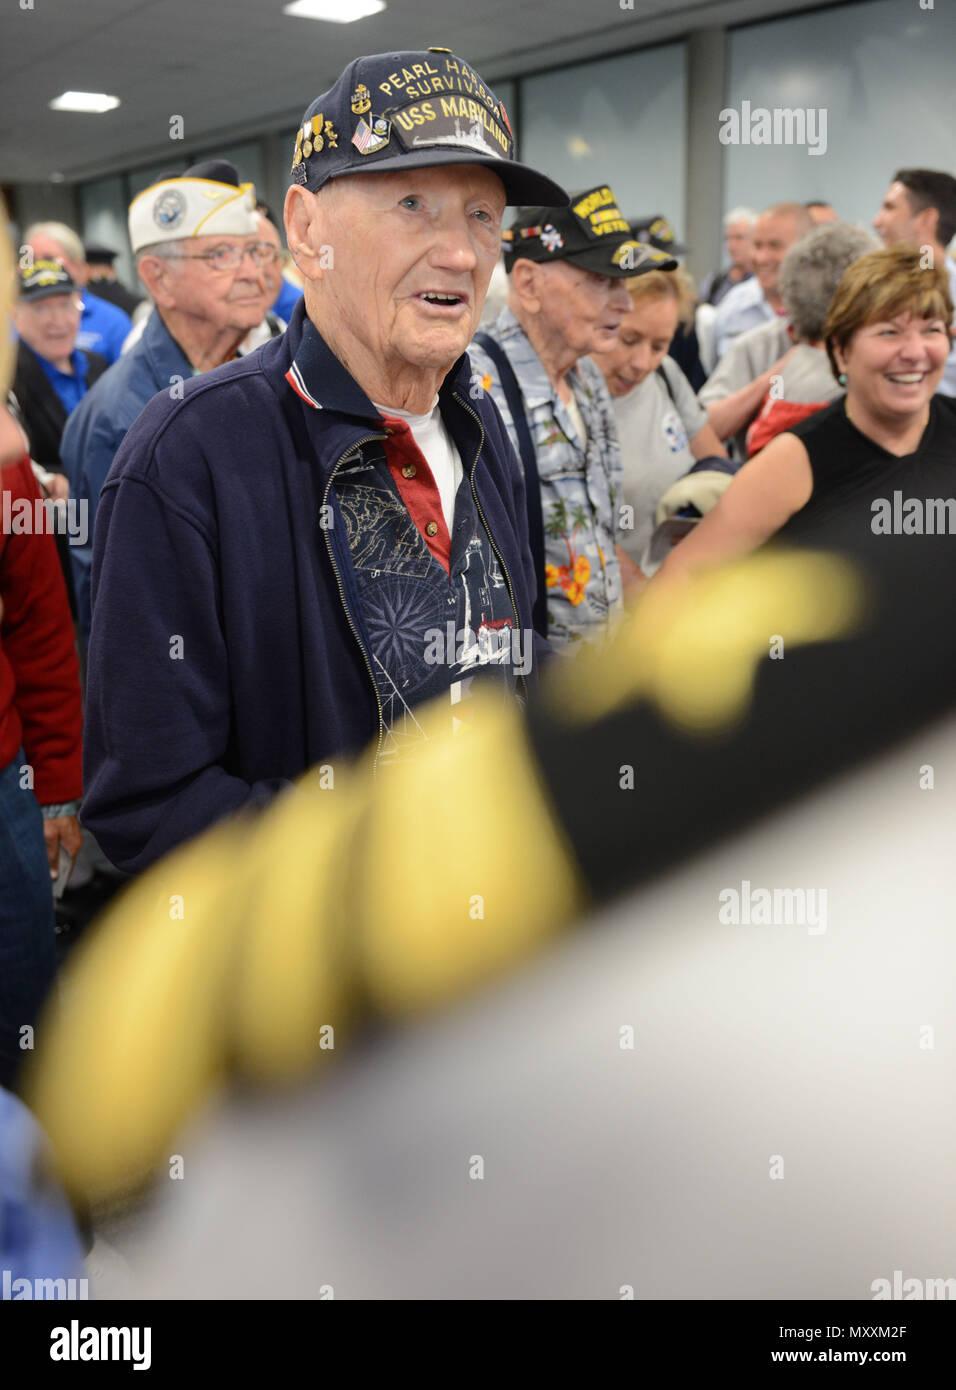 former navy chief petty officer howard bender a world war ii